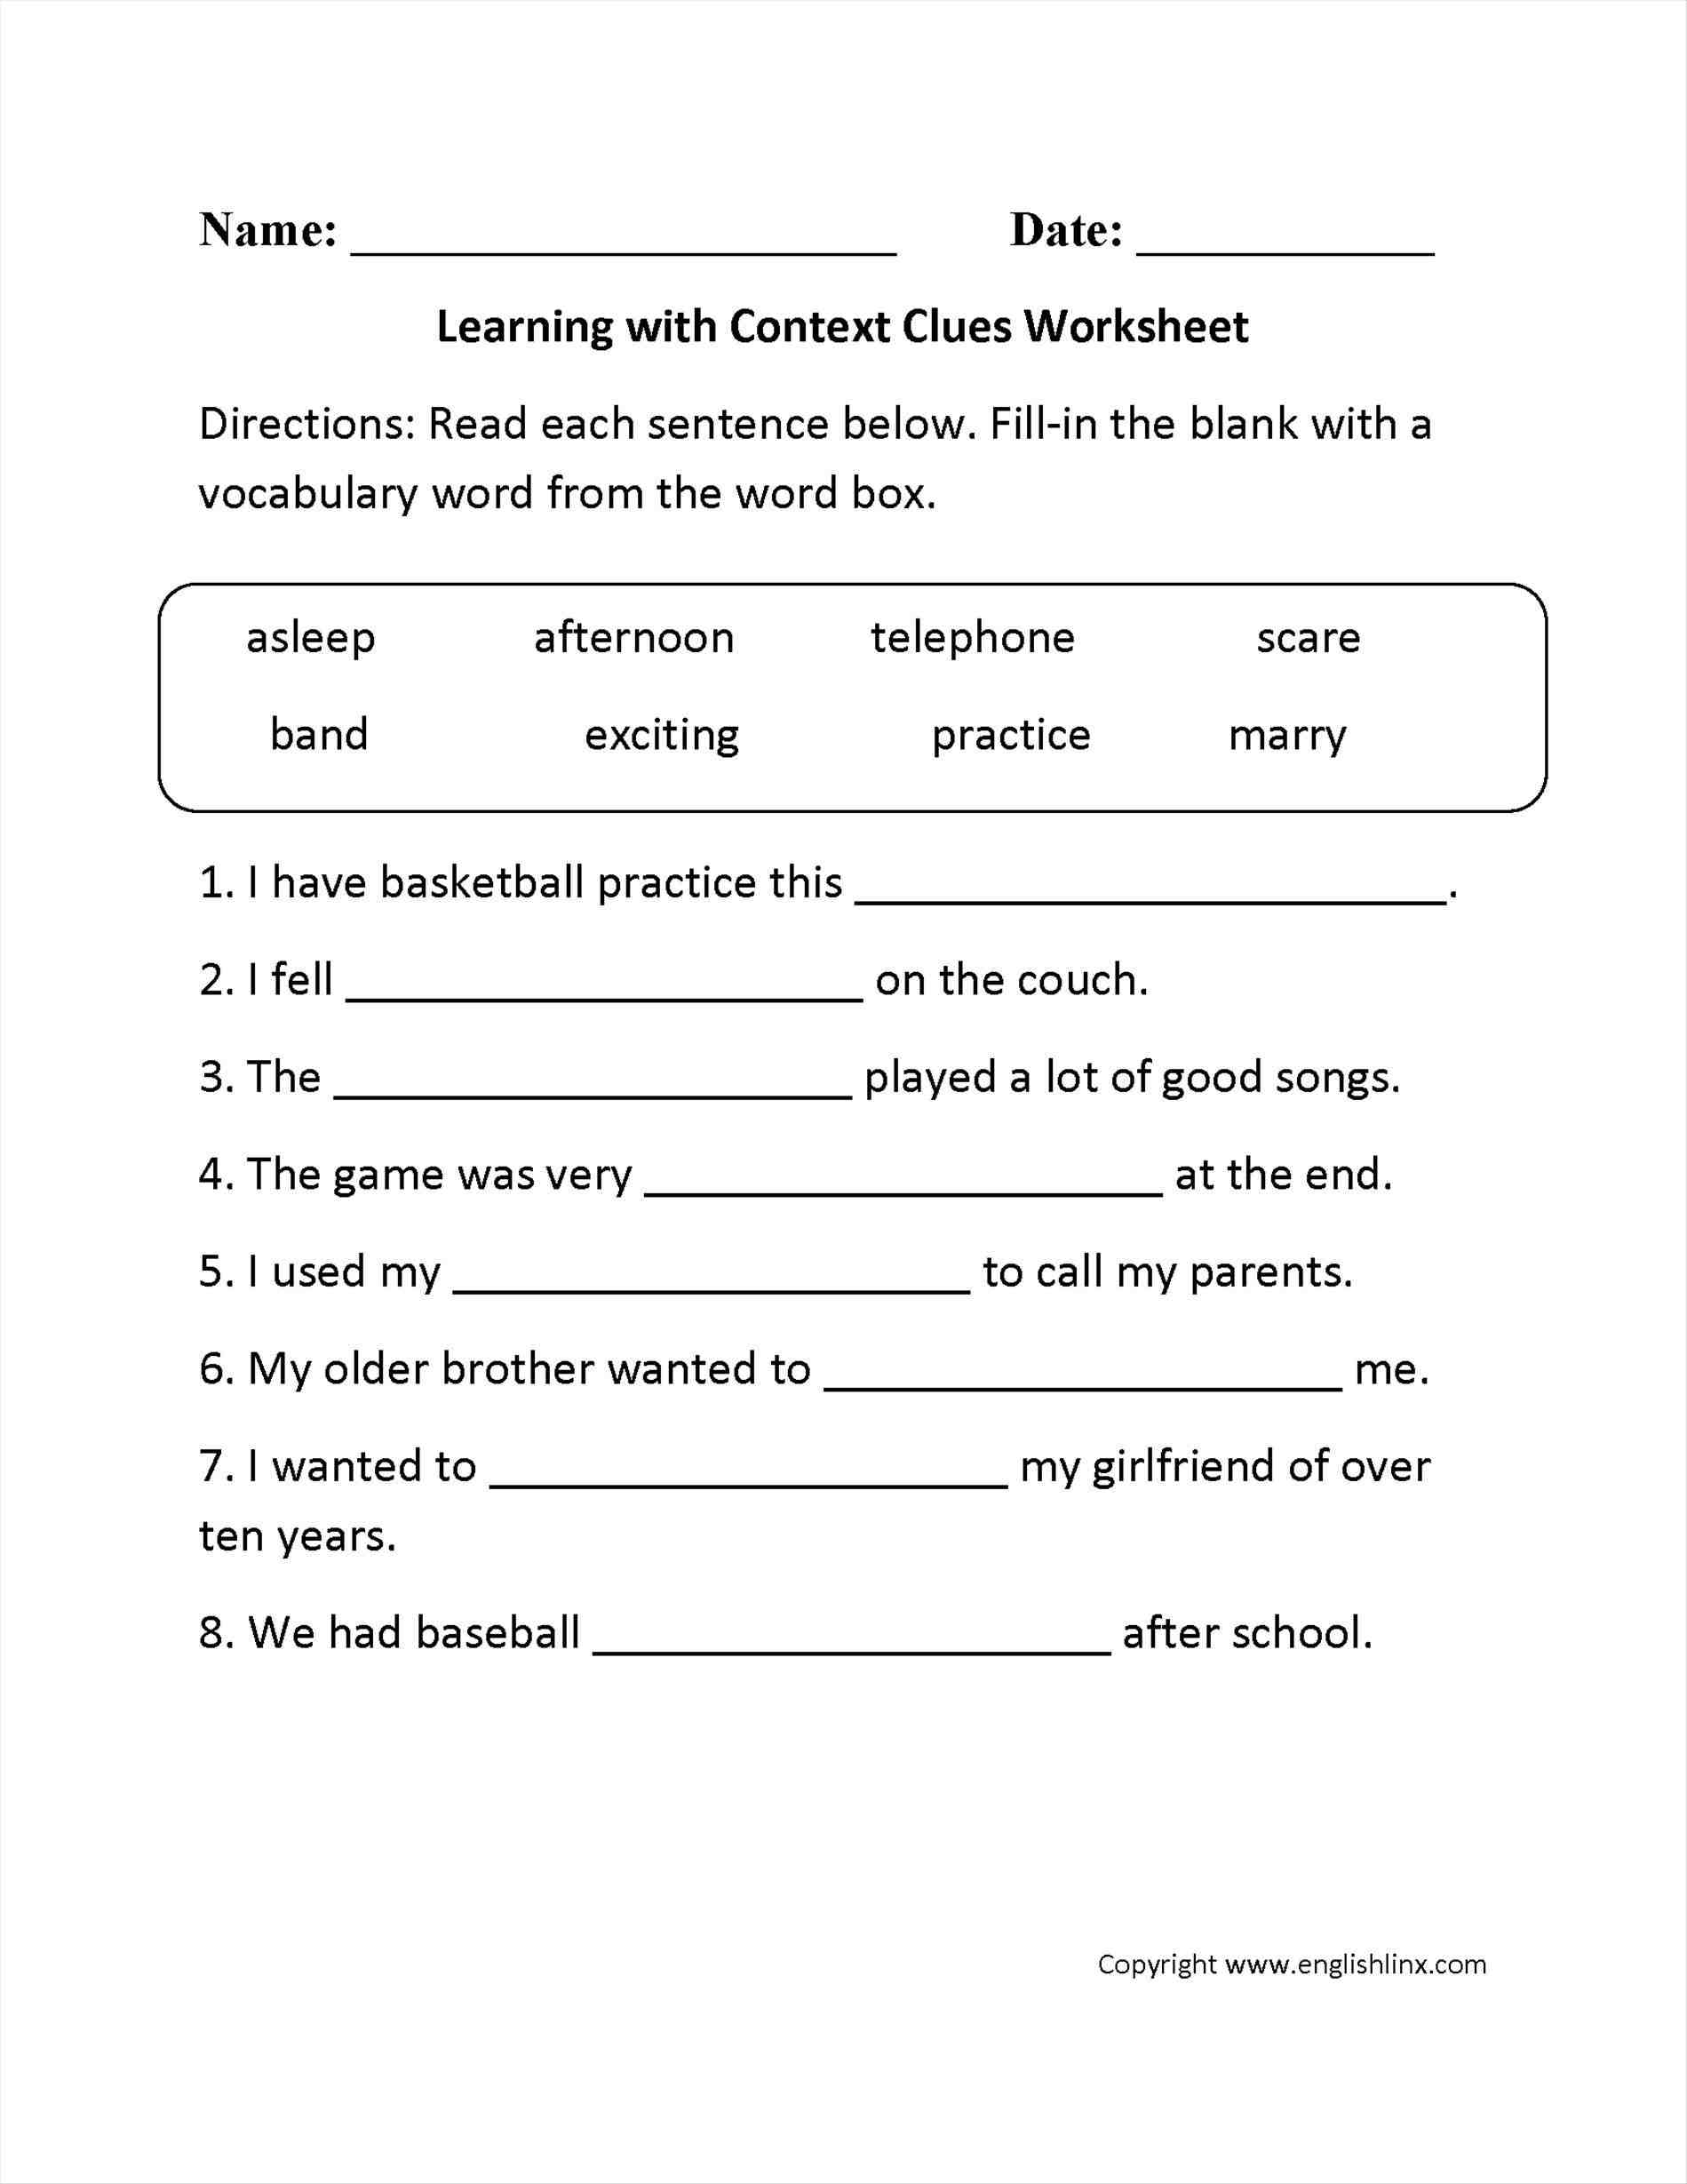 Worksheet  Drawing Conclusions Worksheet  Lindacoppens Worksheet